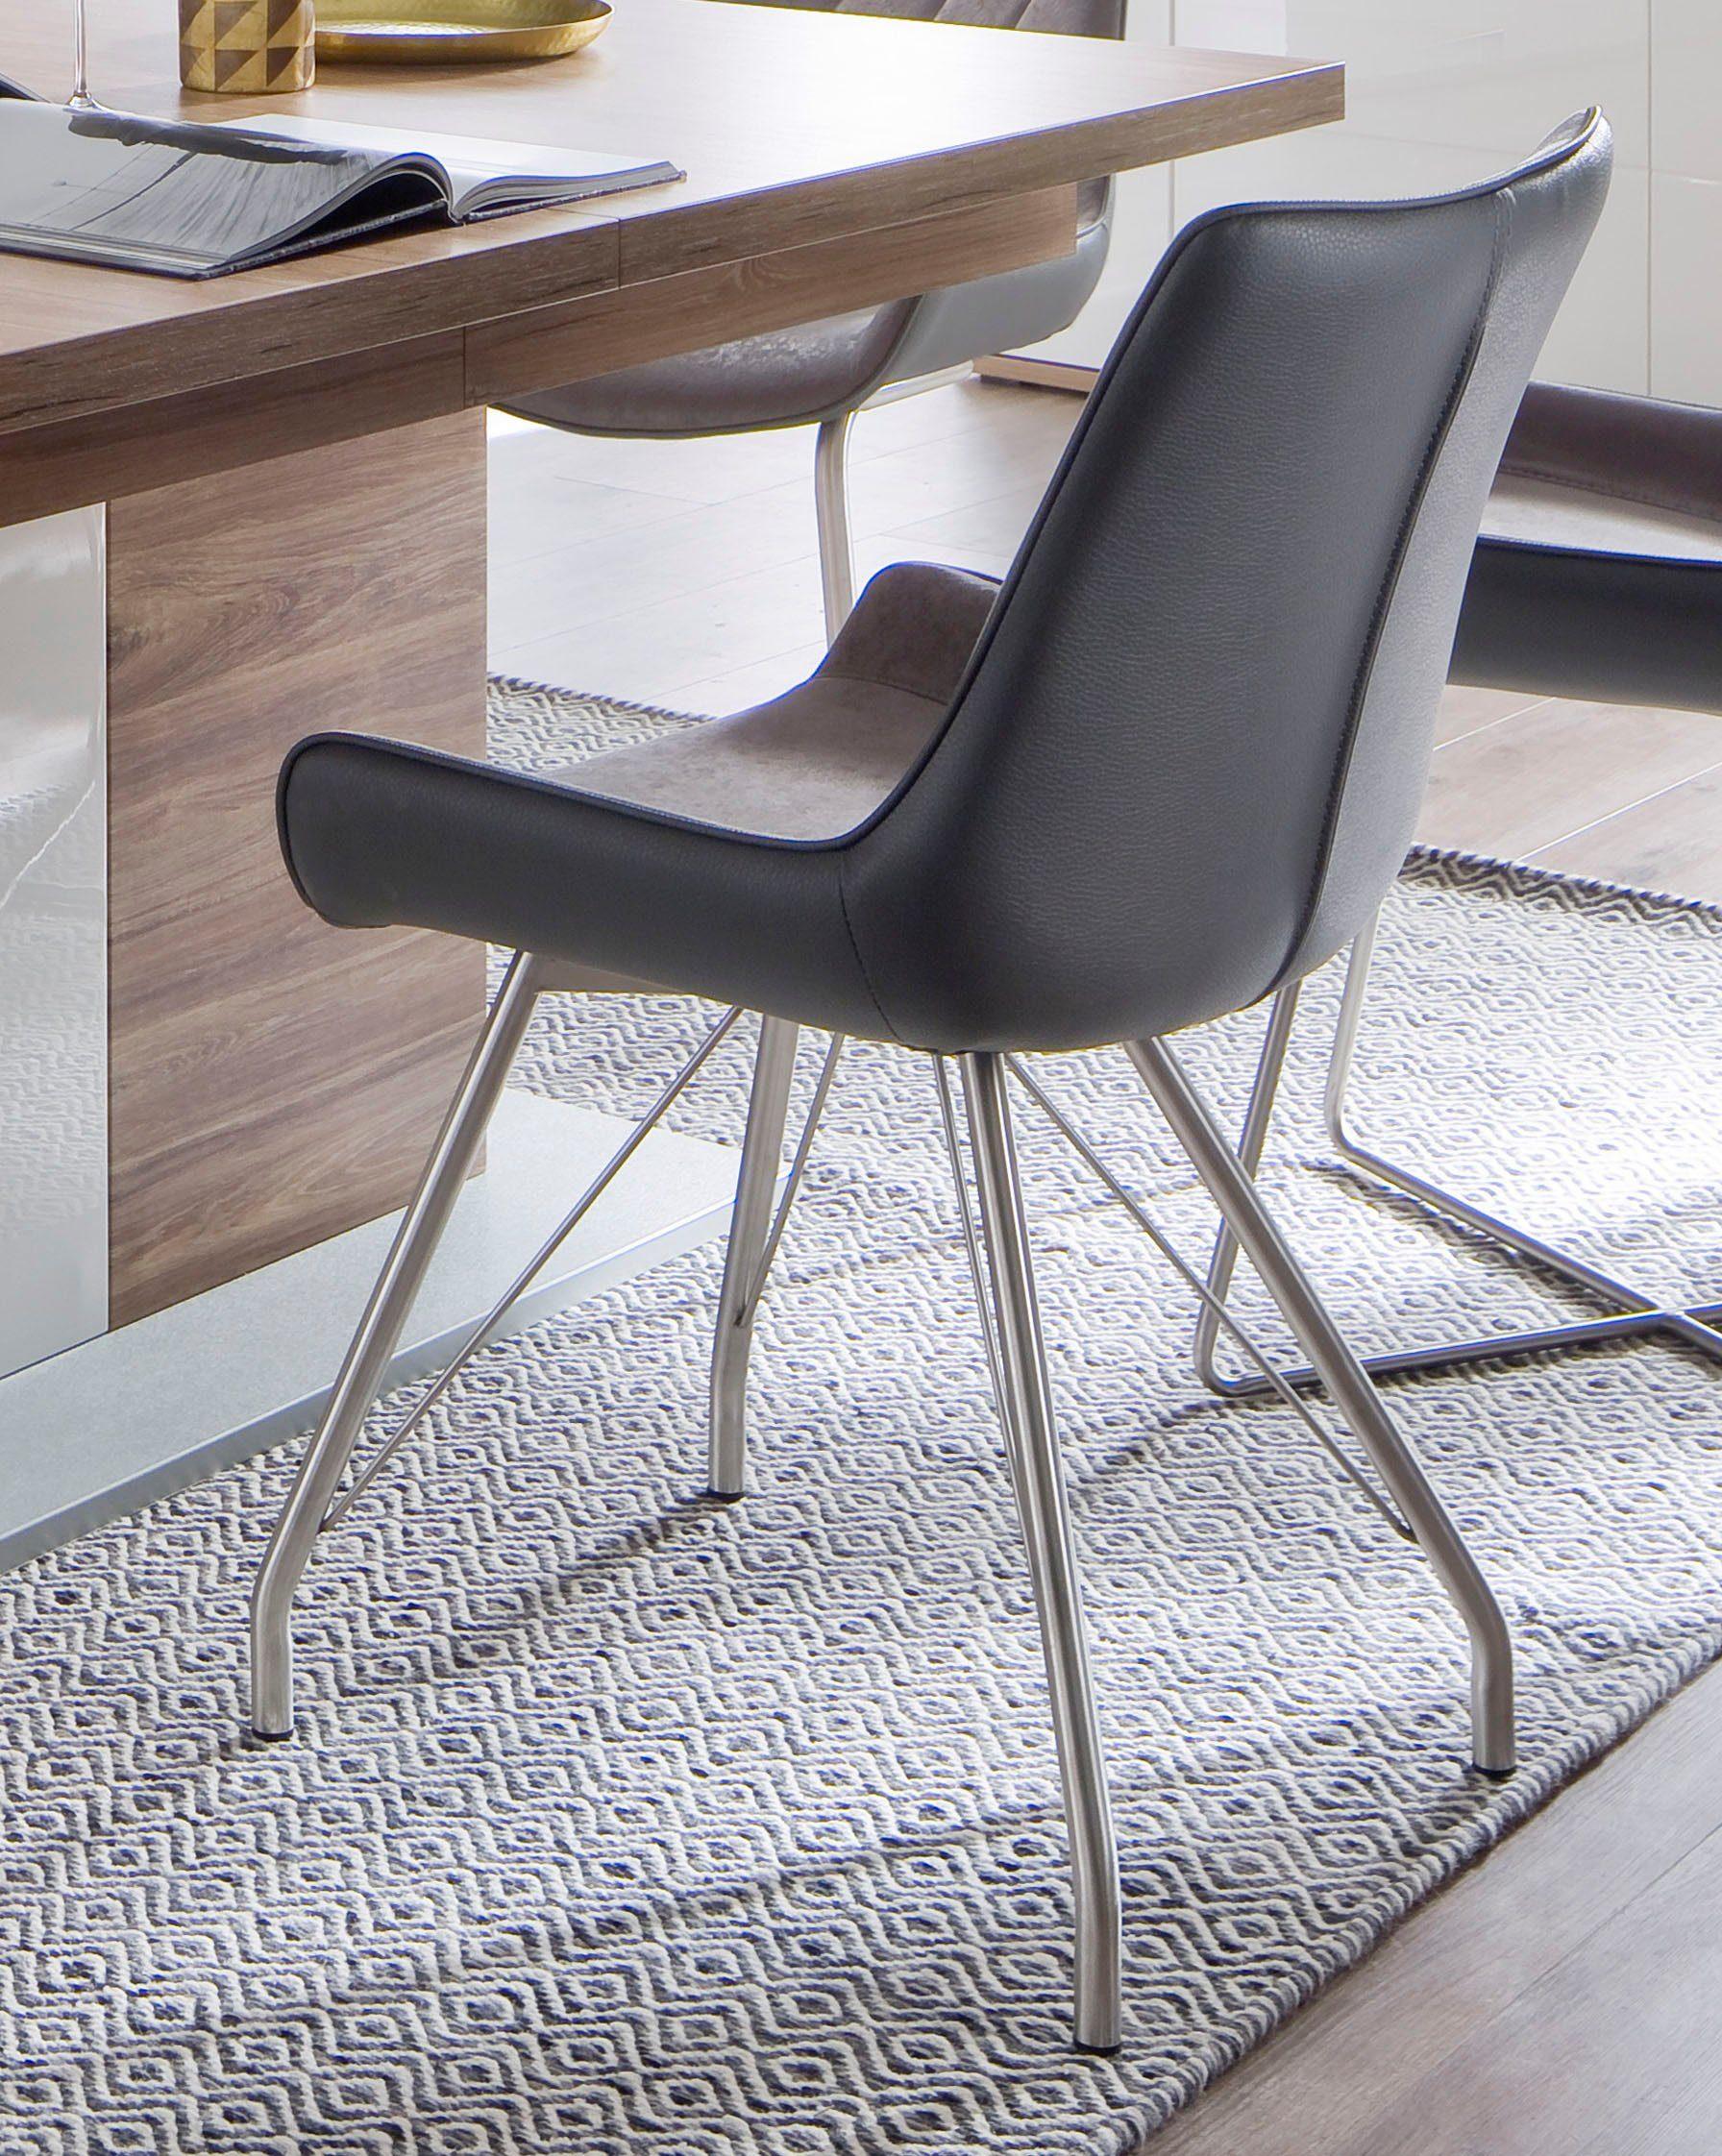 MCA furniture 4 Fußstuhl »Danita A« 2er Set, Stuhl bis 120 Kg belastbar online kaufen | OTTO